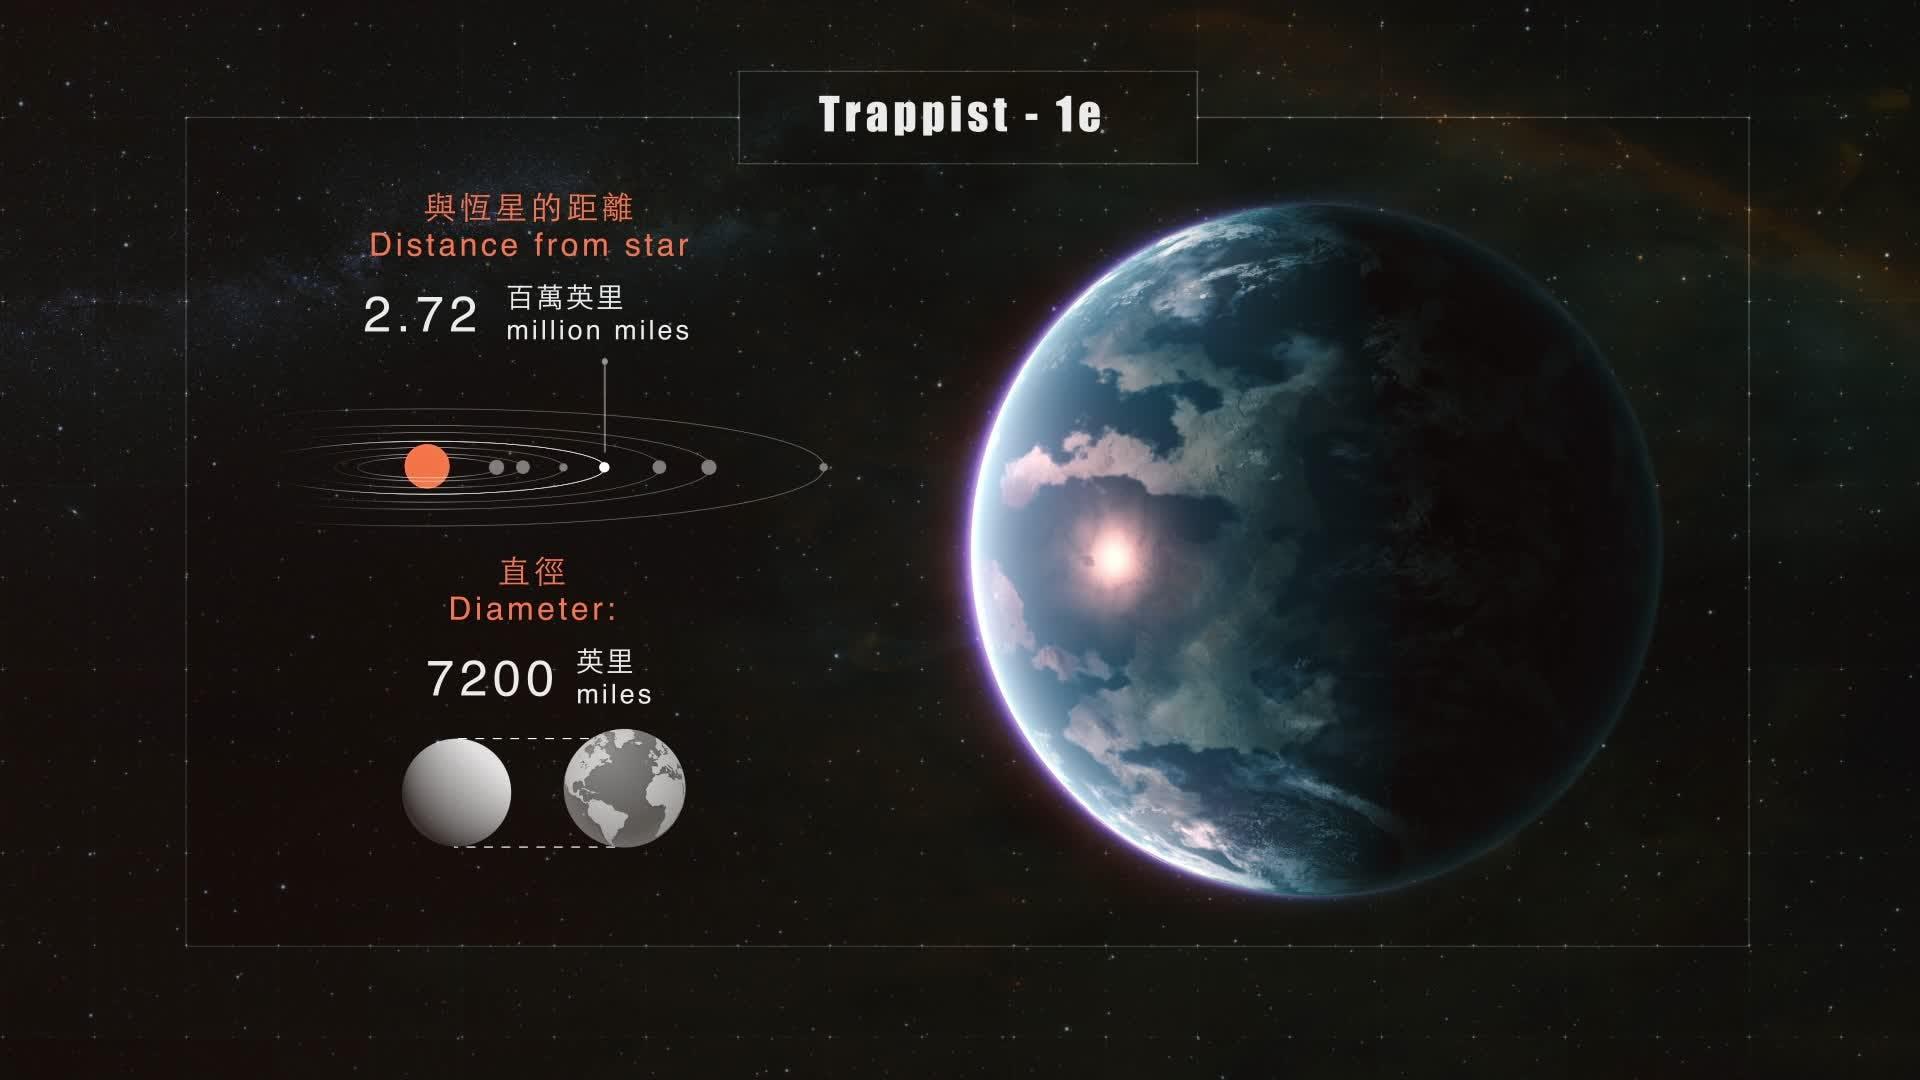 Exoplanet_13